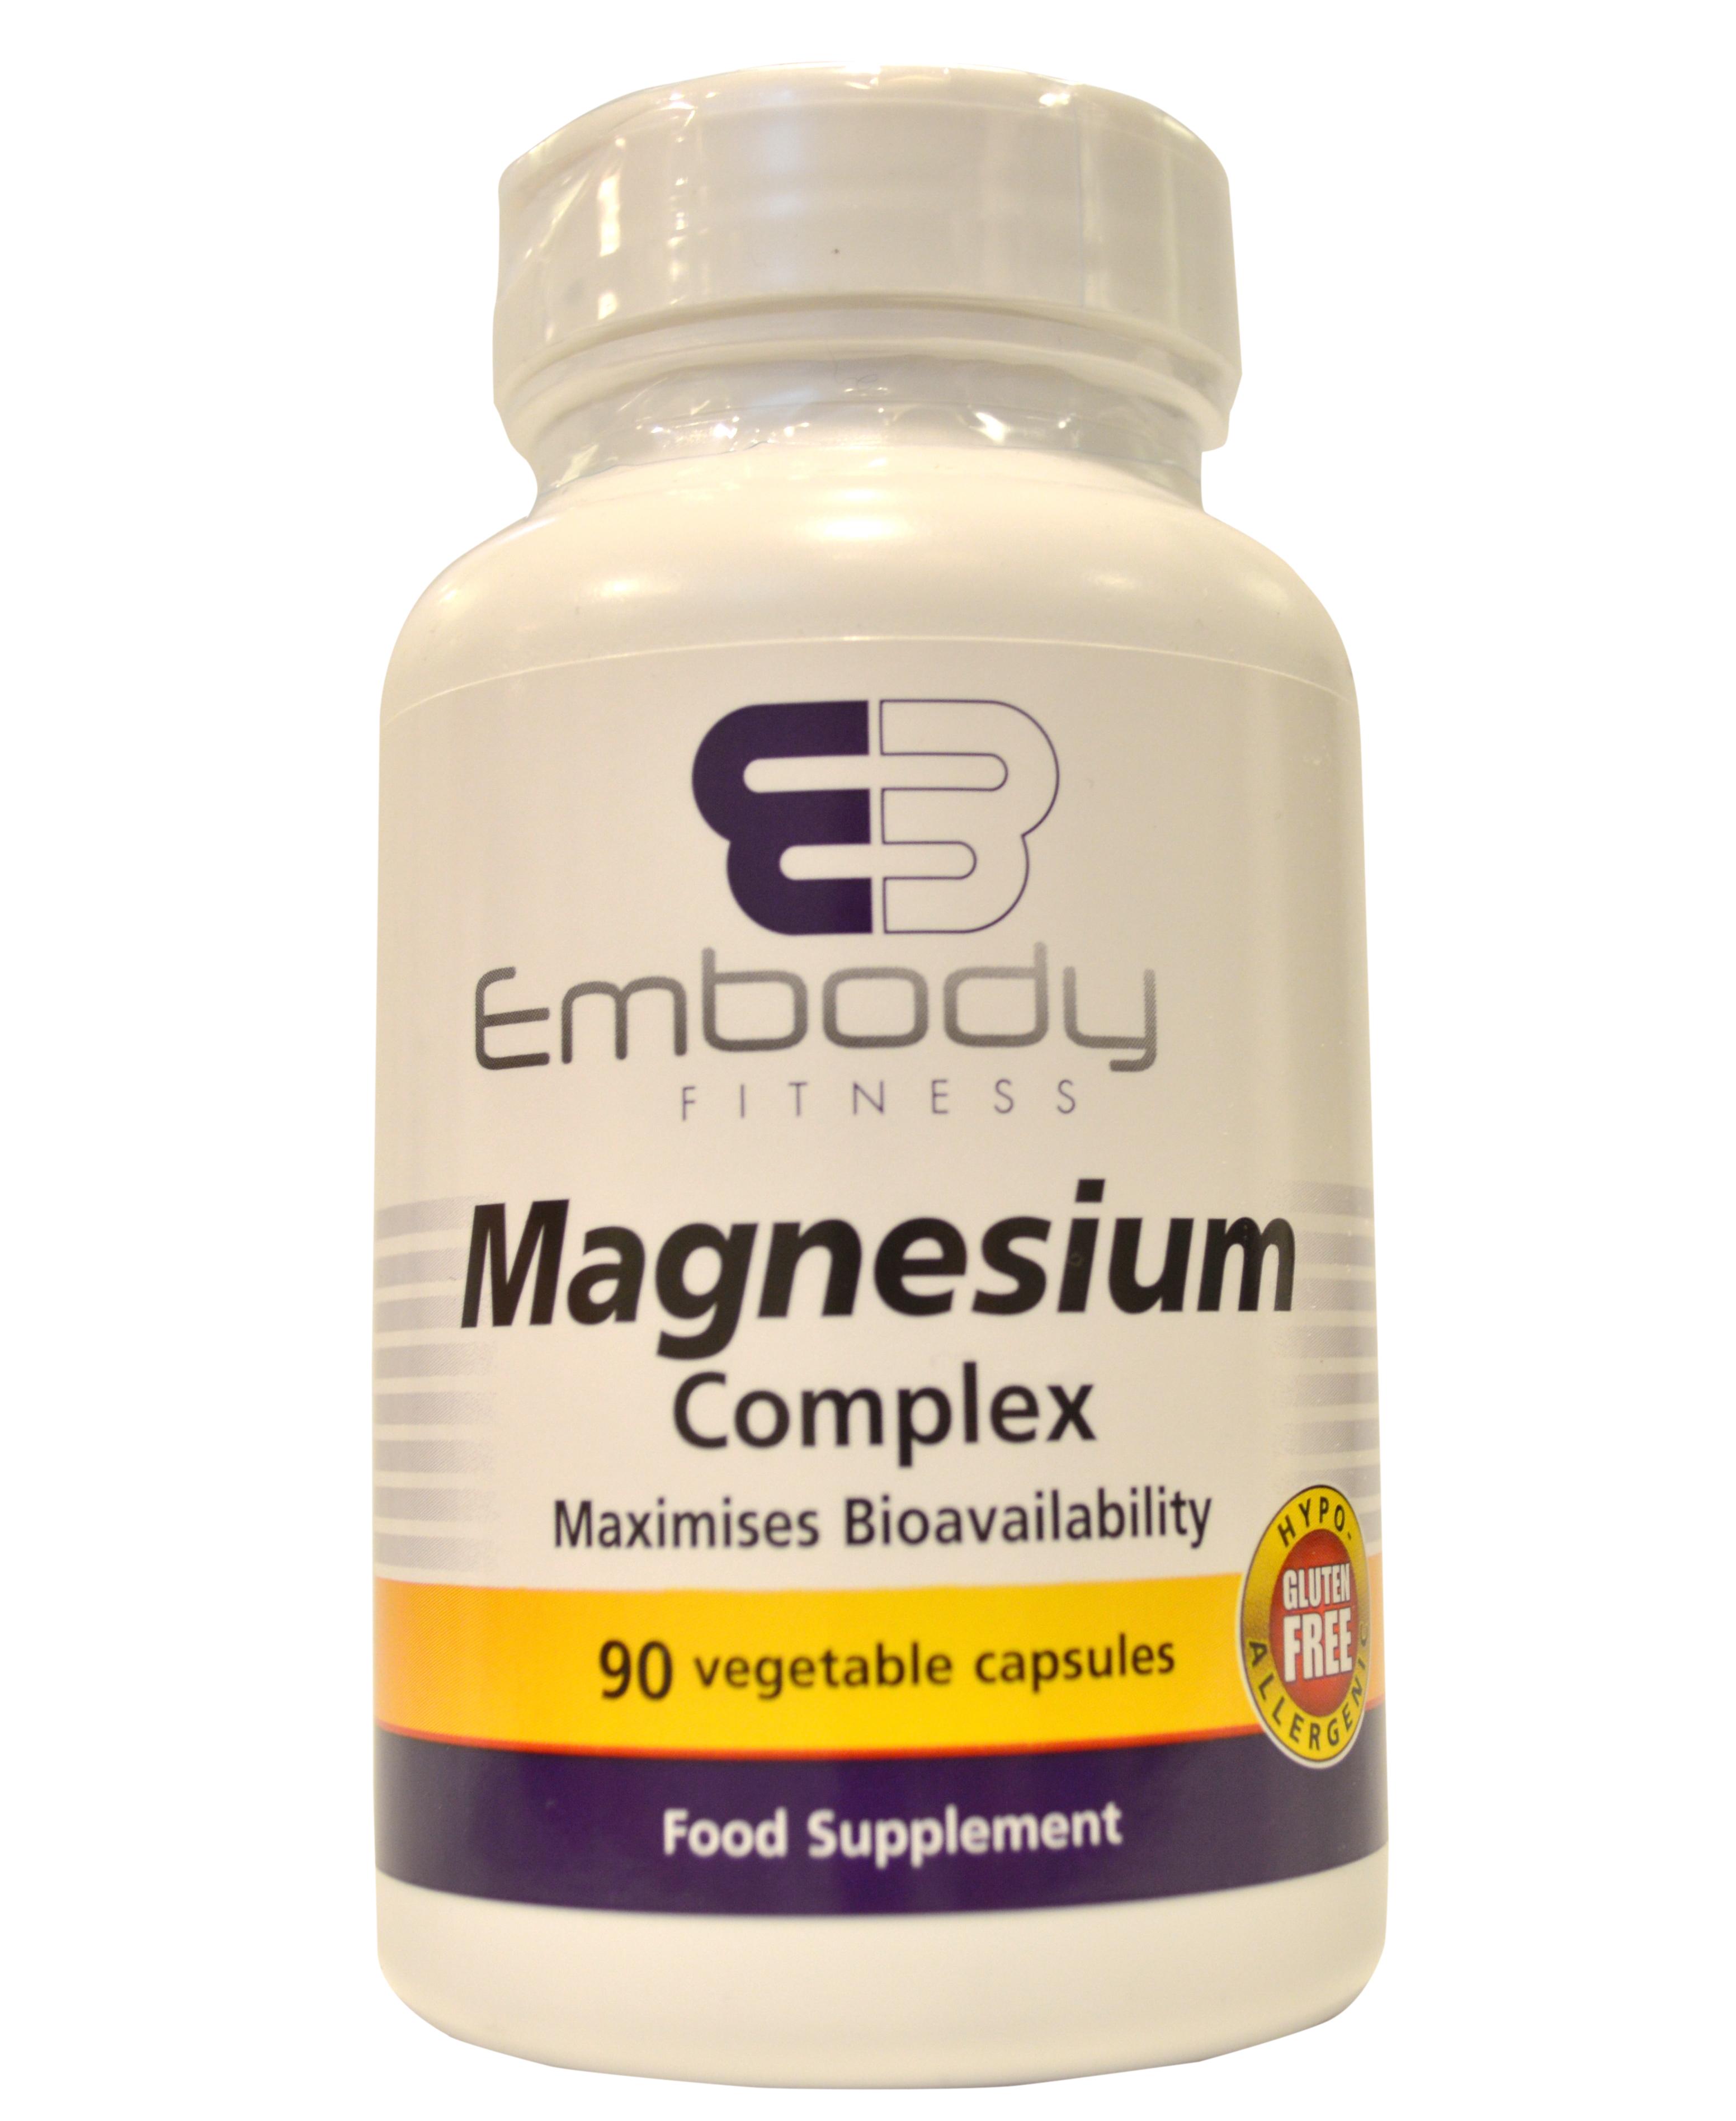 EF_products_Magnesium